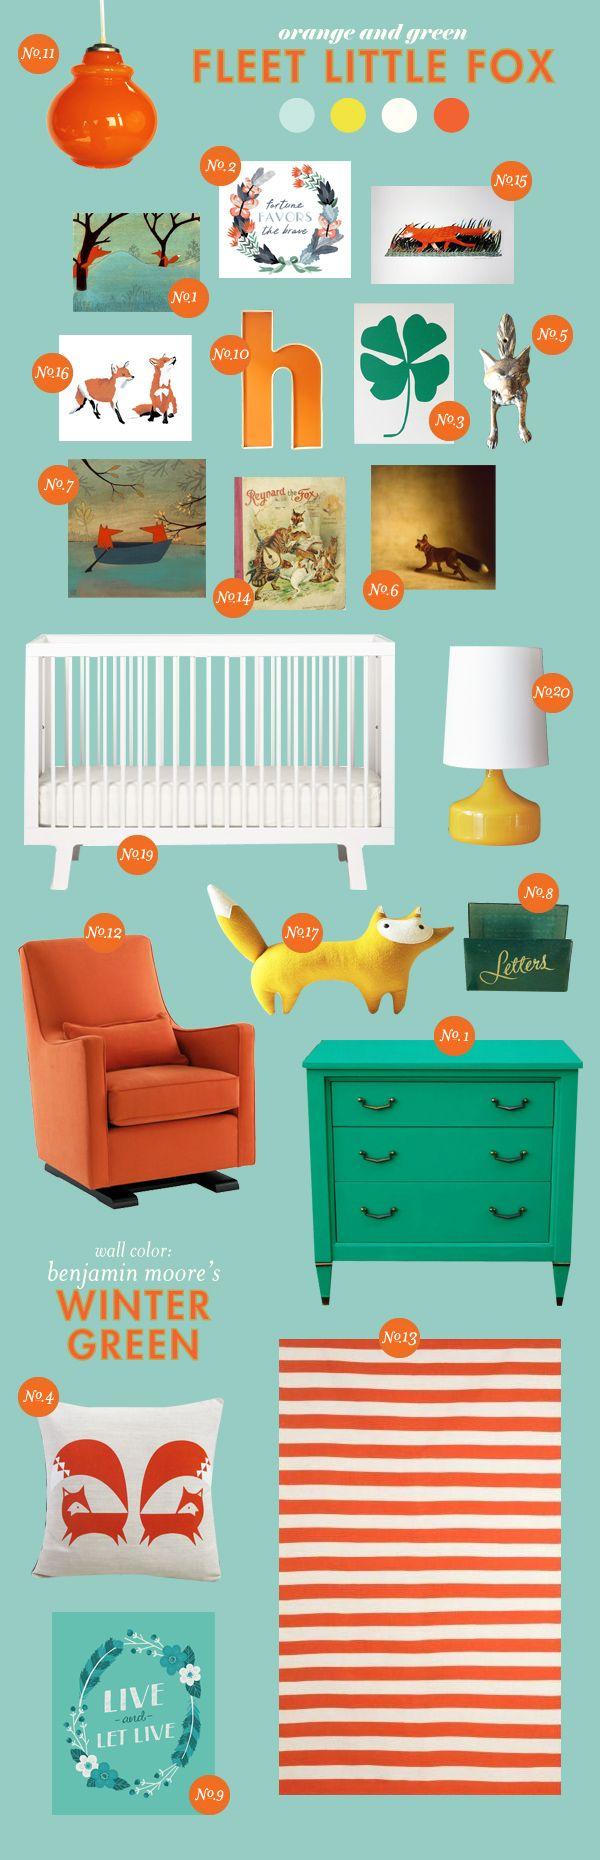 fleet fox nursery: Nurseries Inspiration, Foxes Theme, Boys Nurseries, Foxes Nurseries, Inspiration Boards, Colors Schemes, Baby Rooms, Nurseries Ideas, Baby Nurseries